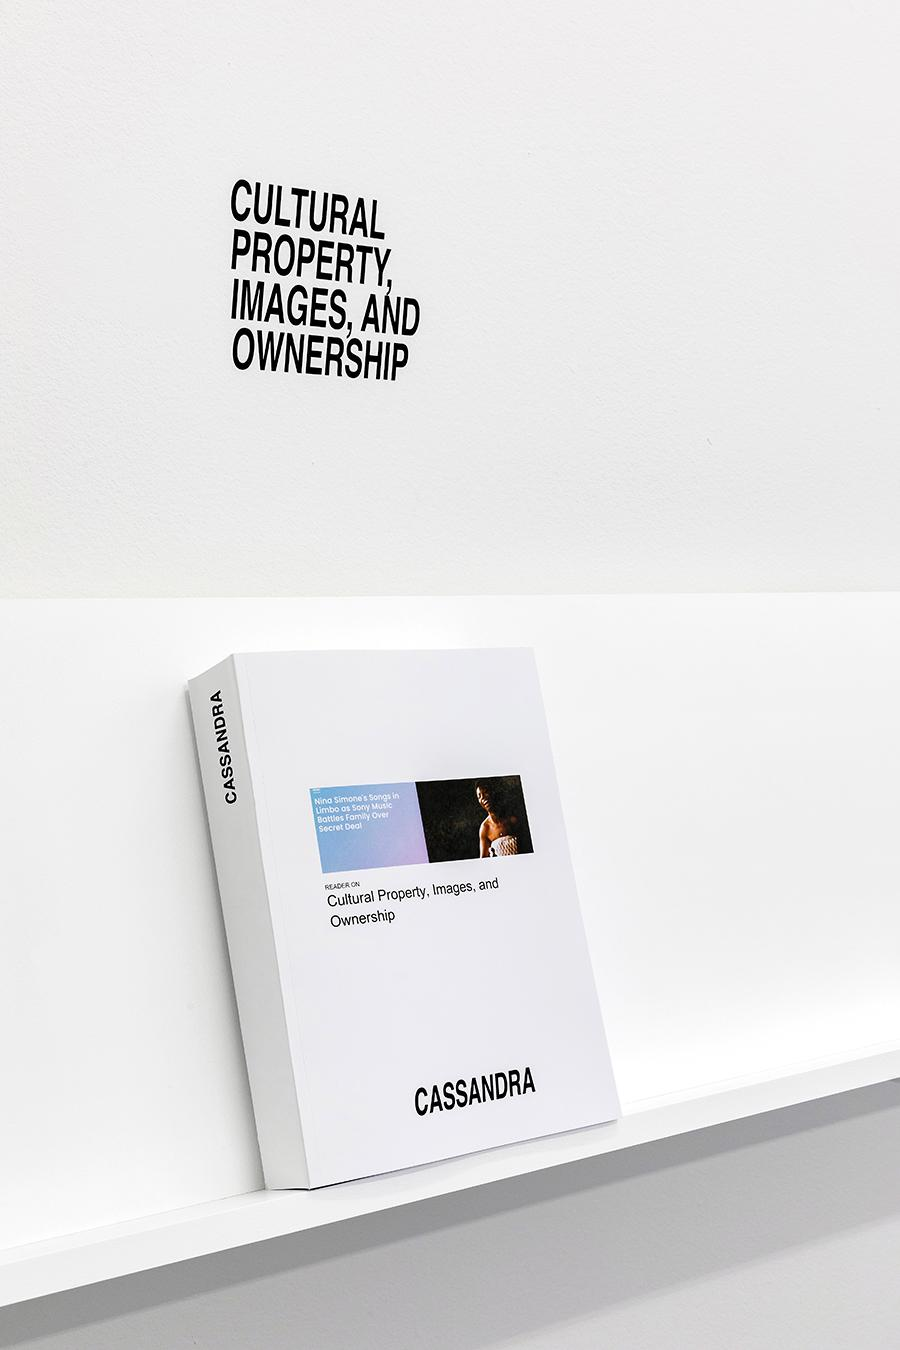 'Cassandra Press – New Publications', 2021, Luma Westbau, Zurich, installation view. Courtesy: Cassandra Press; photograph: Nelly Rodriguez